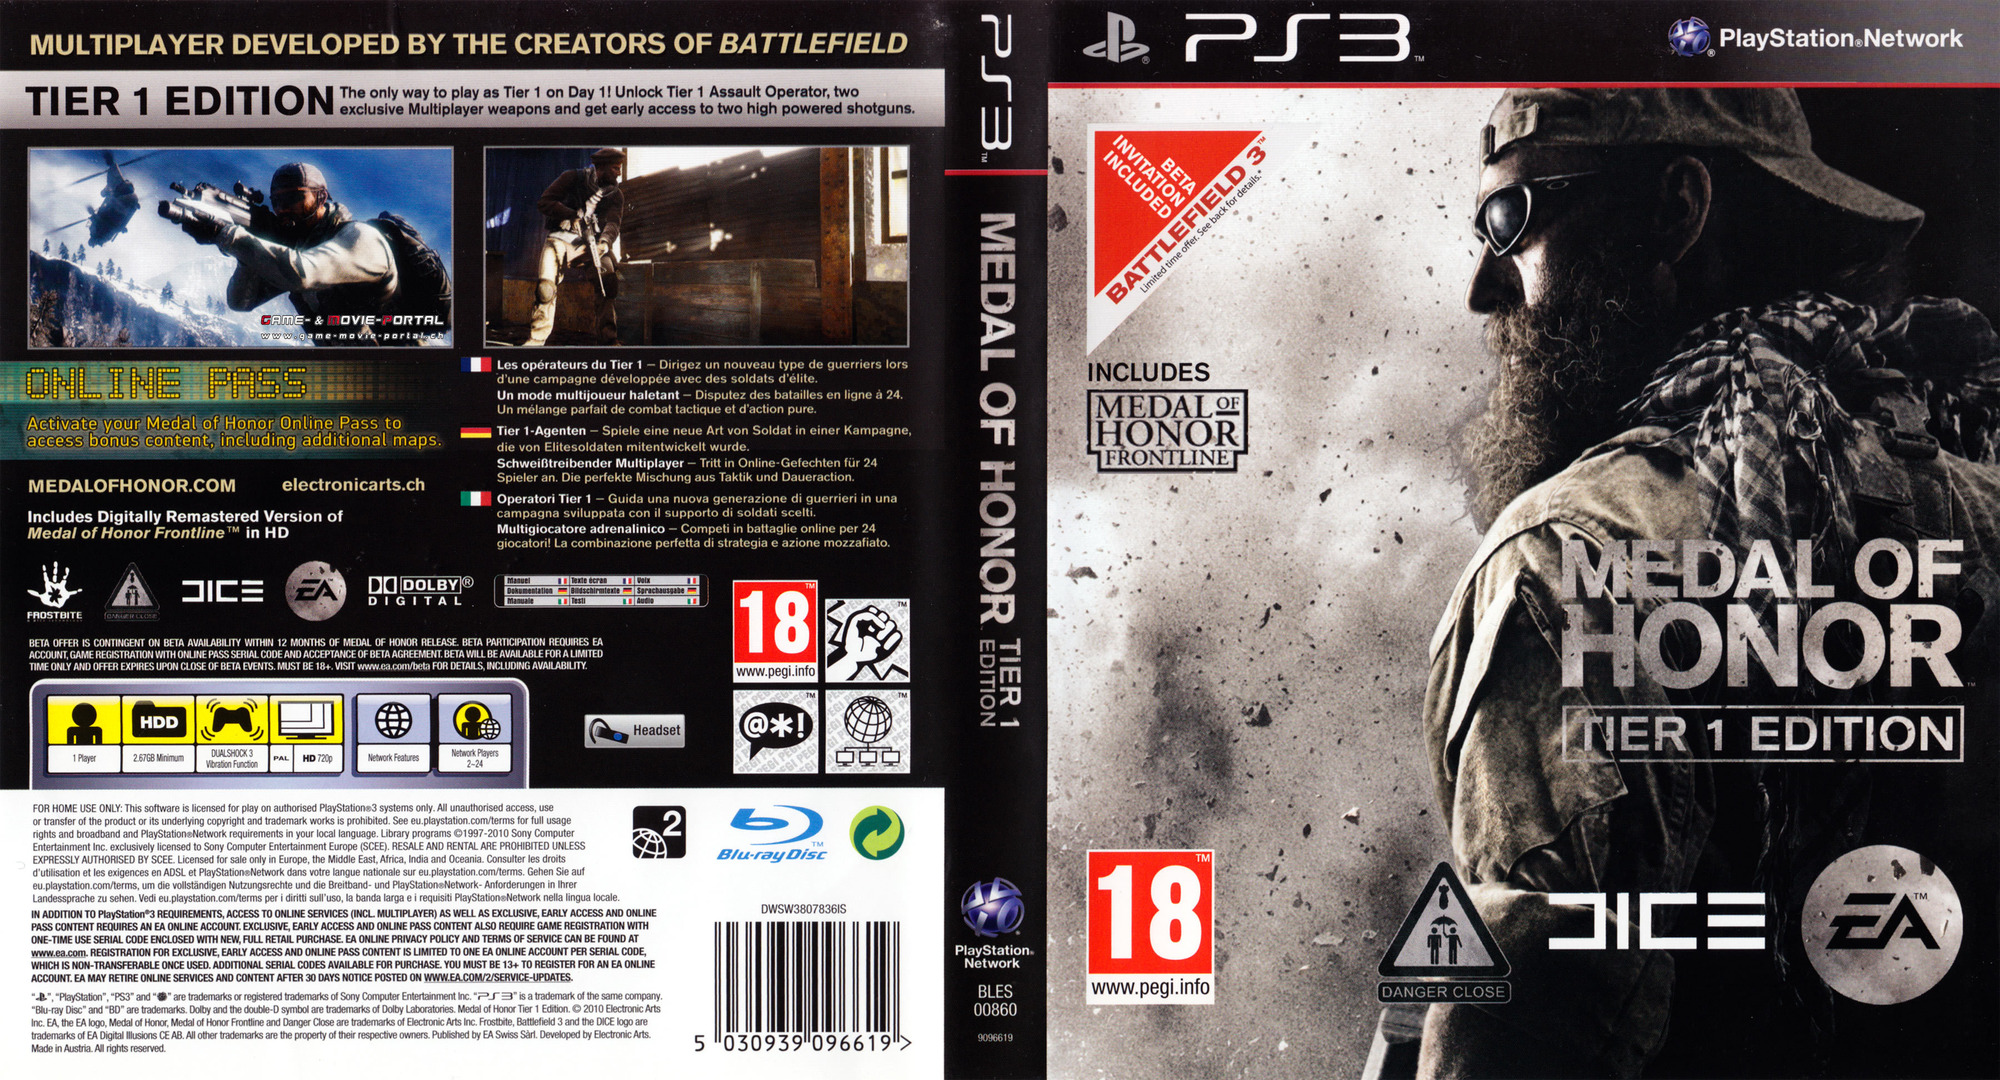 PS3 coverfullHQ2 (BLES00860)